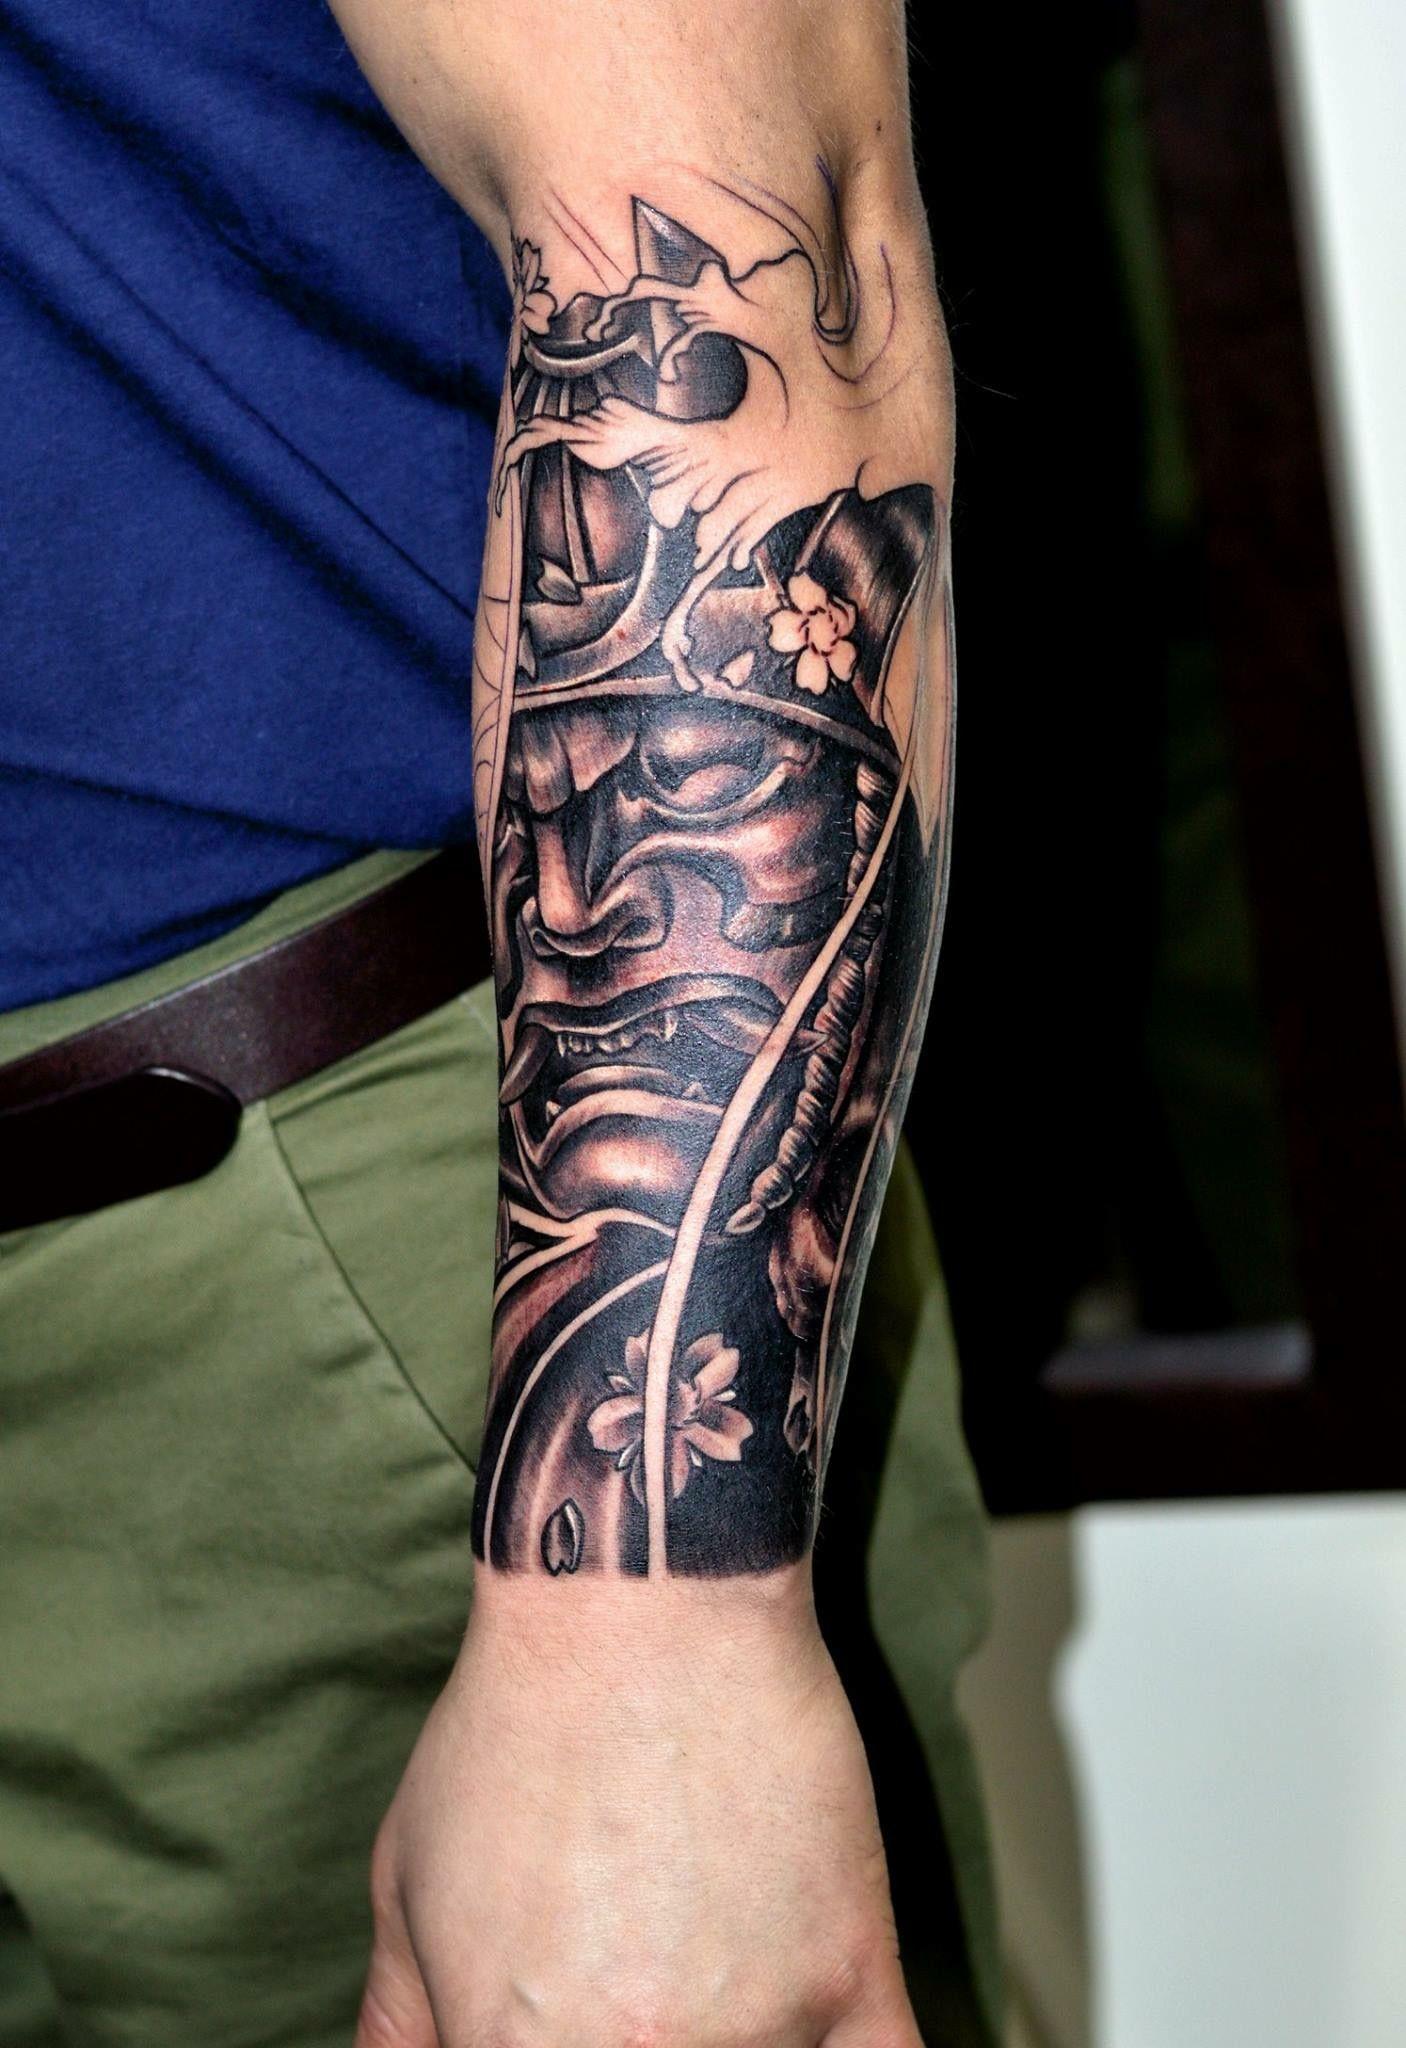 Japanese Forearm Tattoo : japanese, forearm, tattoo, Tatto, Japanese, Forearm, Tattoo,, Samurai, Tattoos